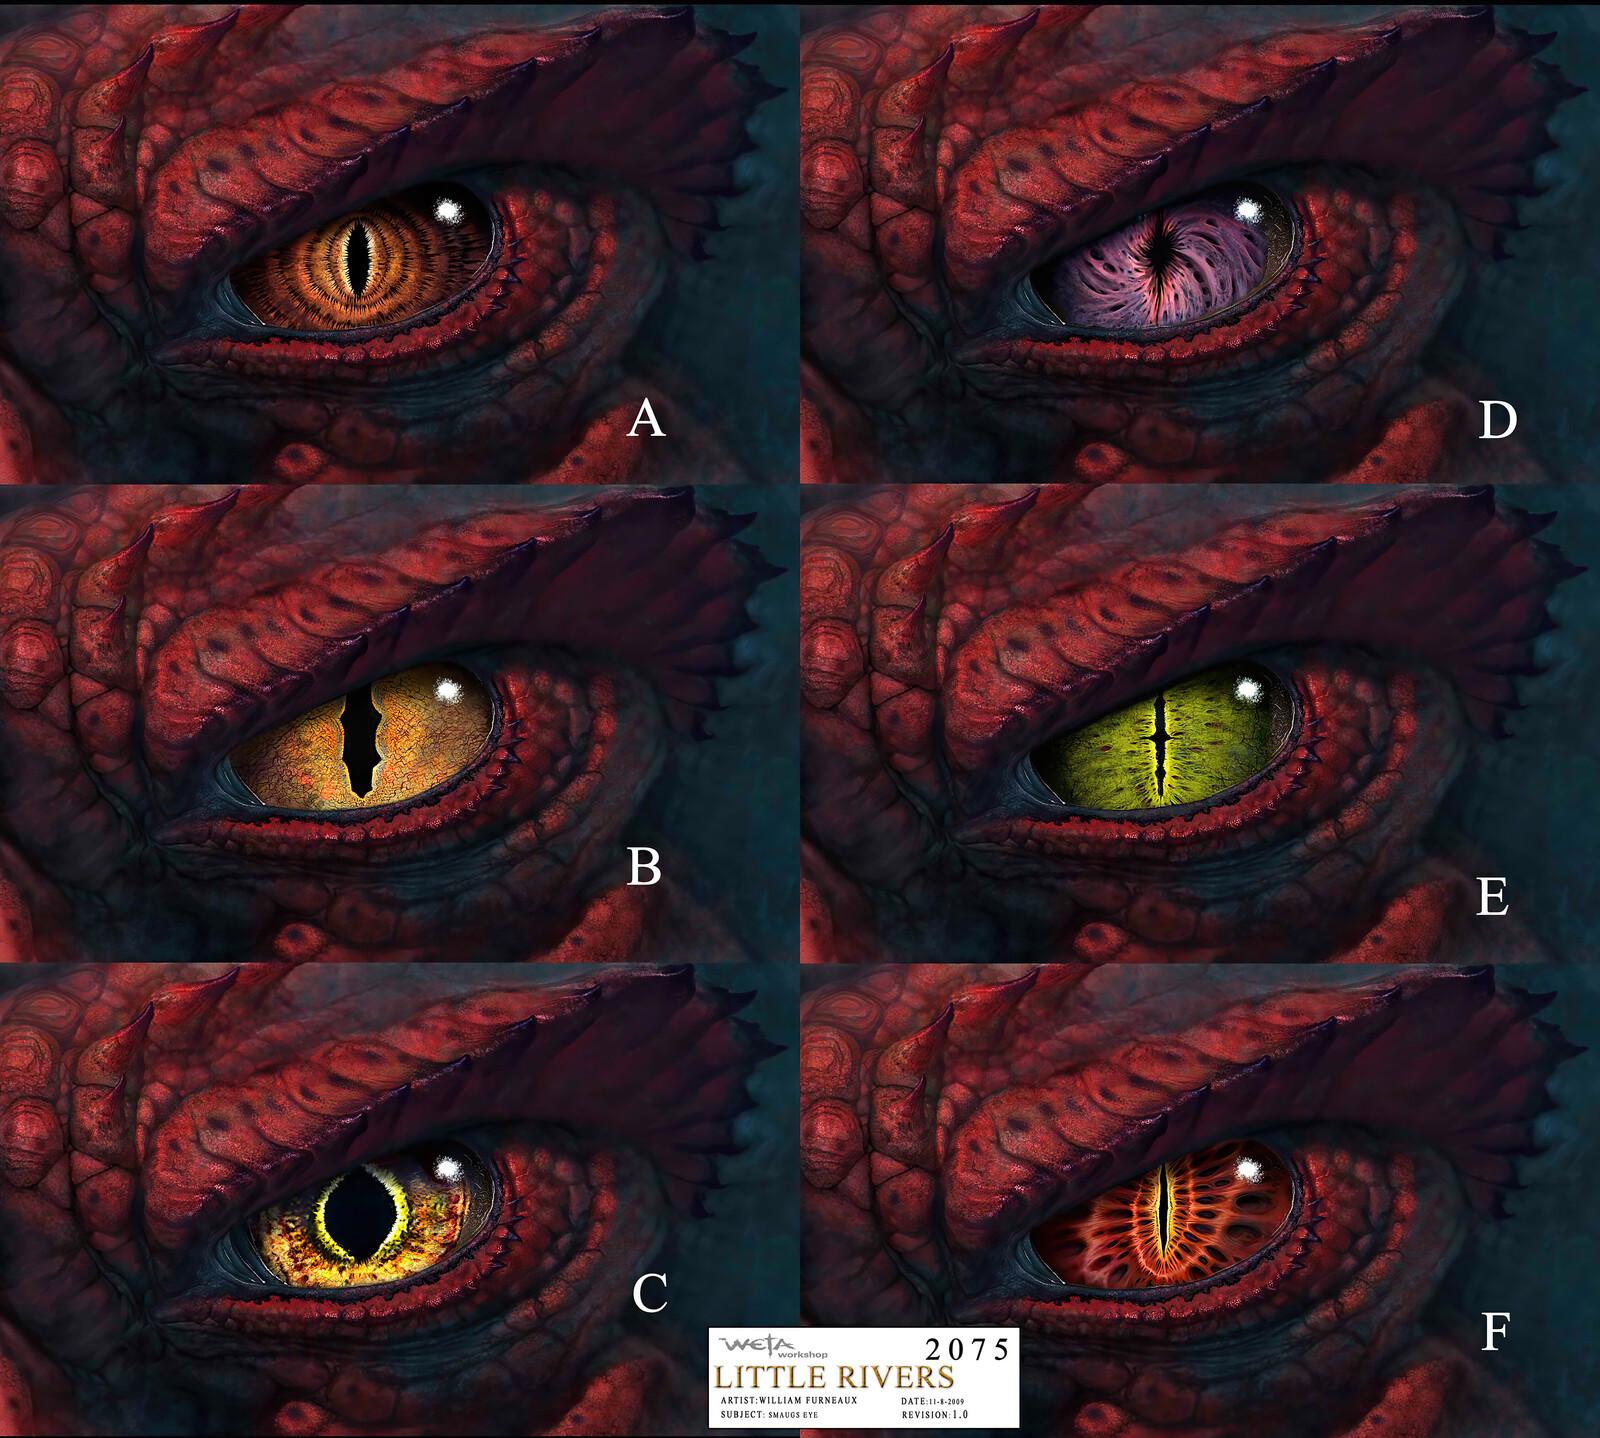 Hobbit - Smaug eye